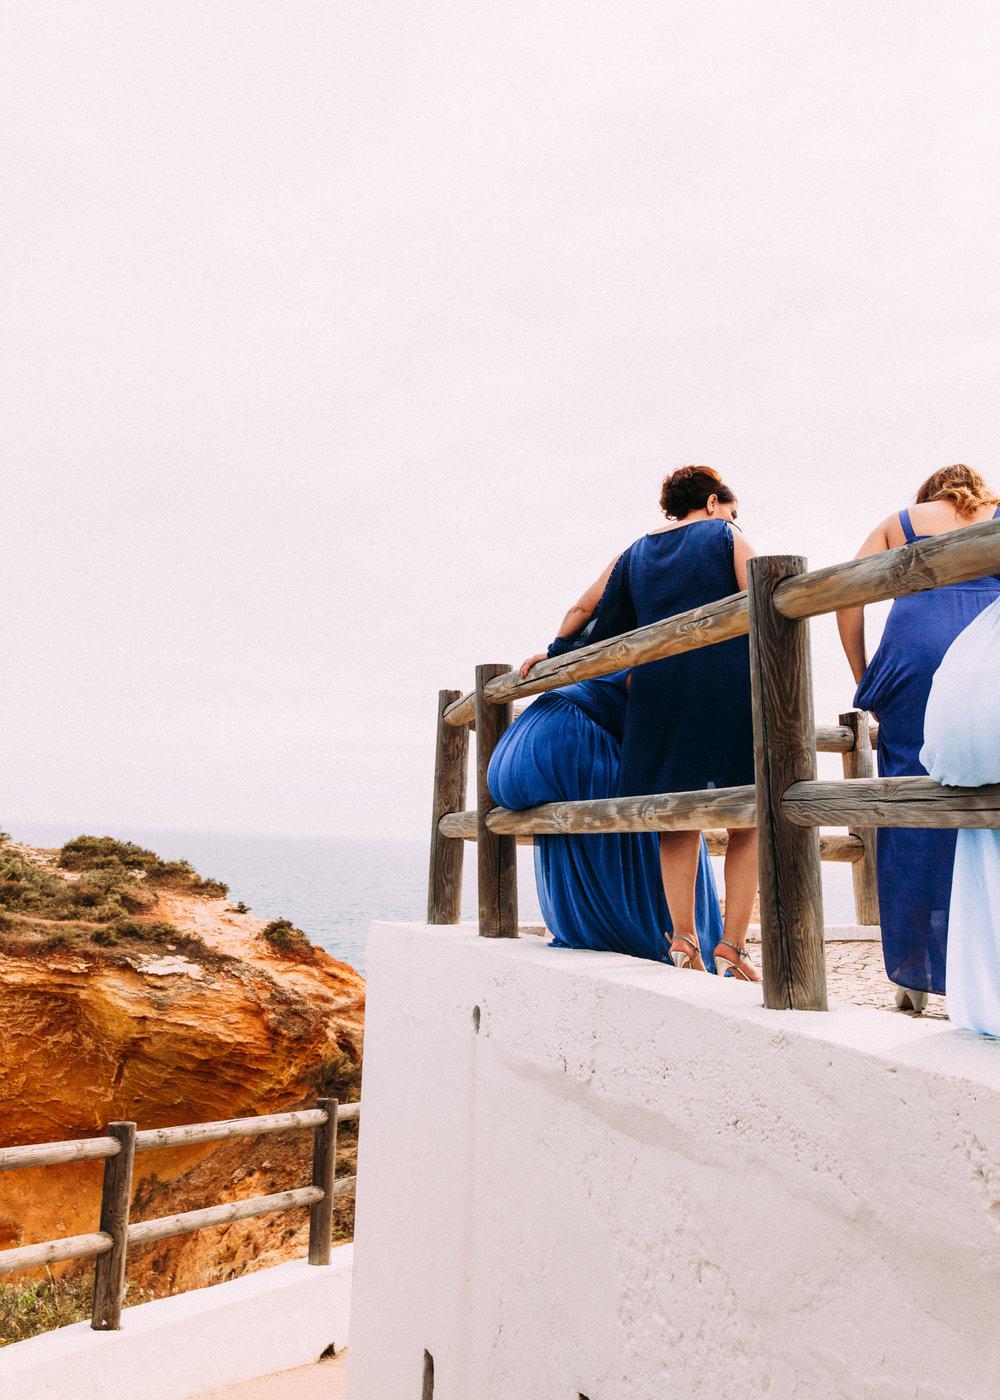 MaxHartmannphoto_Algarve2017-2517.jpg